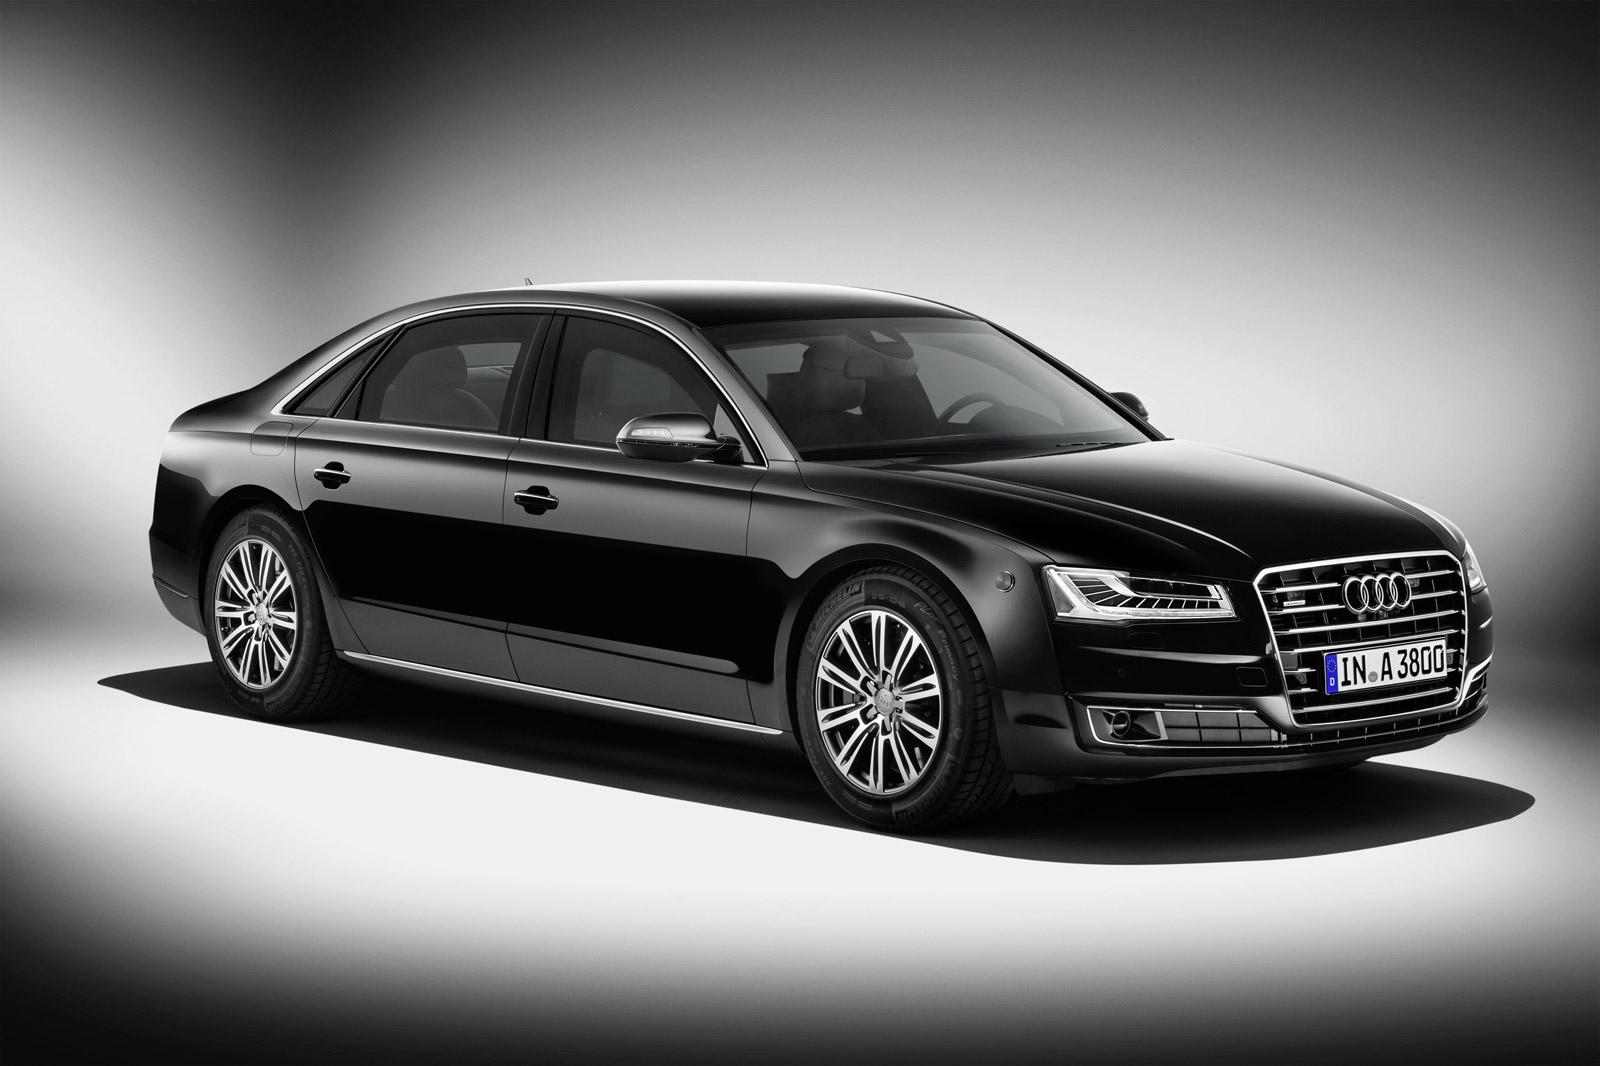 Audi Rolls Out 2015 A8 L Security